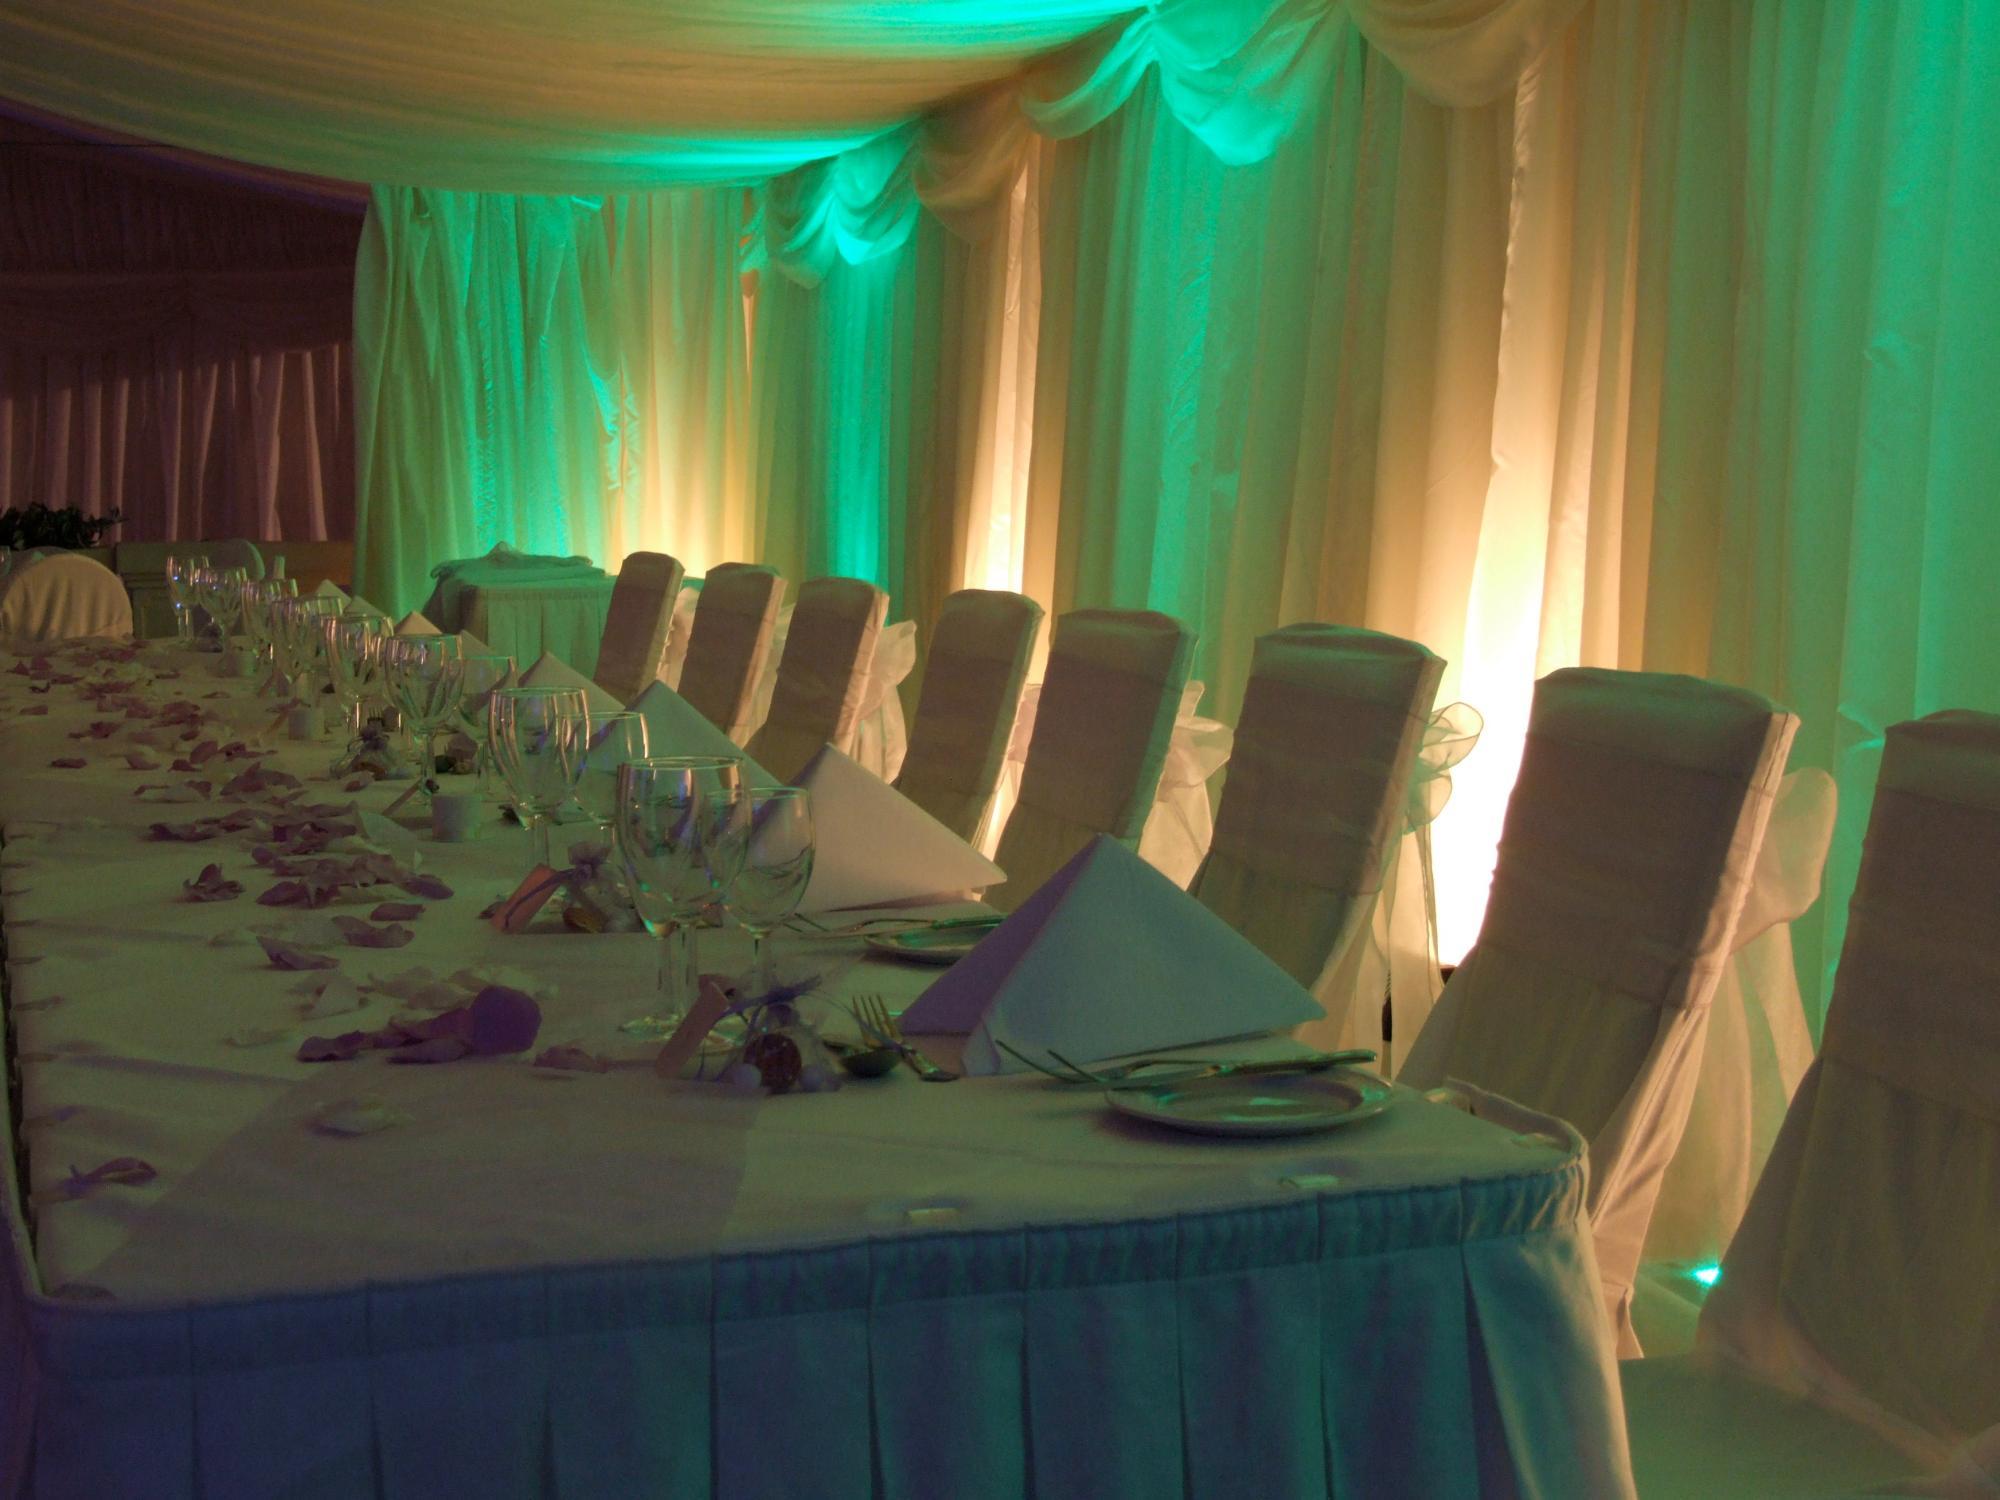 Uplighting, Uplights, Mood Lighting, LED Uplighting Hire, Event Lighting, Indoor  Uplights, Outdoor Uplights Hire